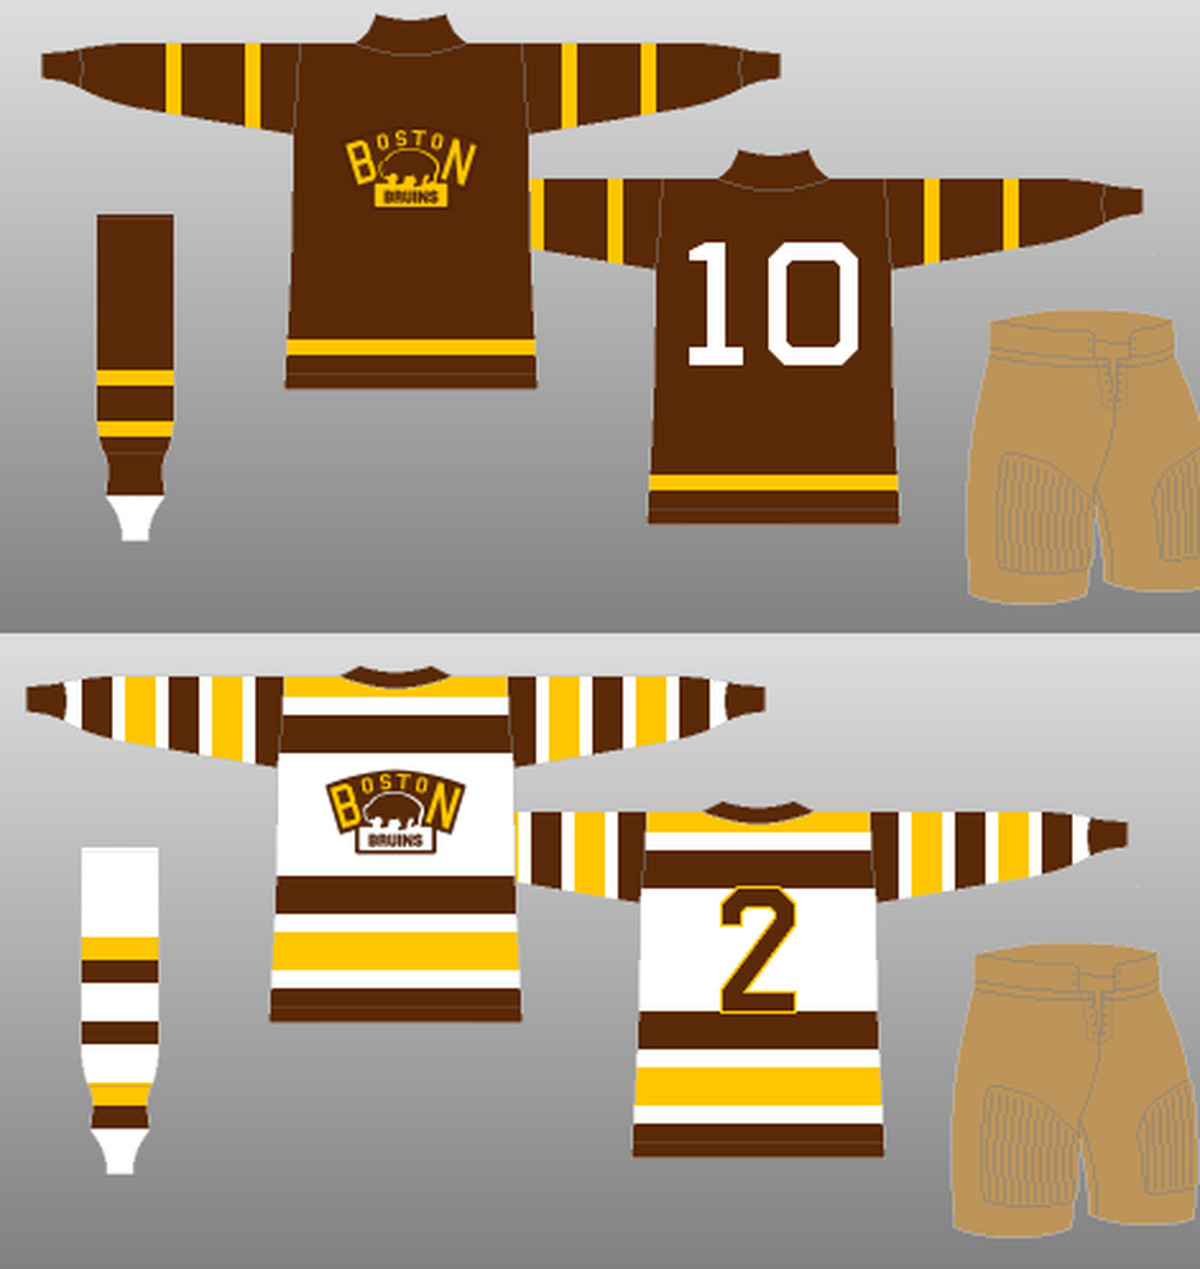 2016 Winter Classic: A Sneak Peek At The Logos The Bruins